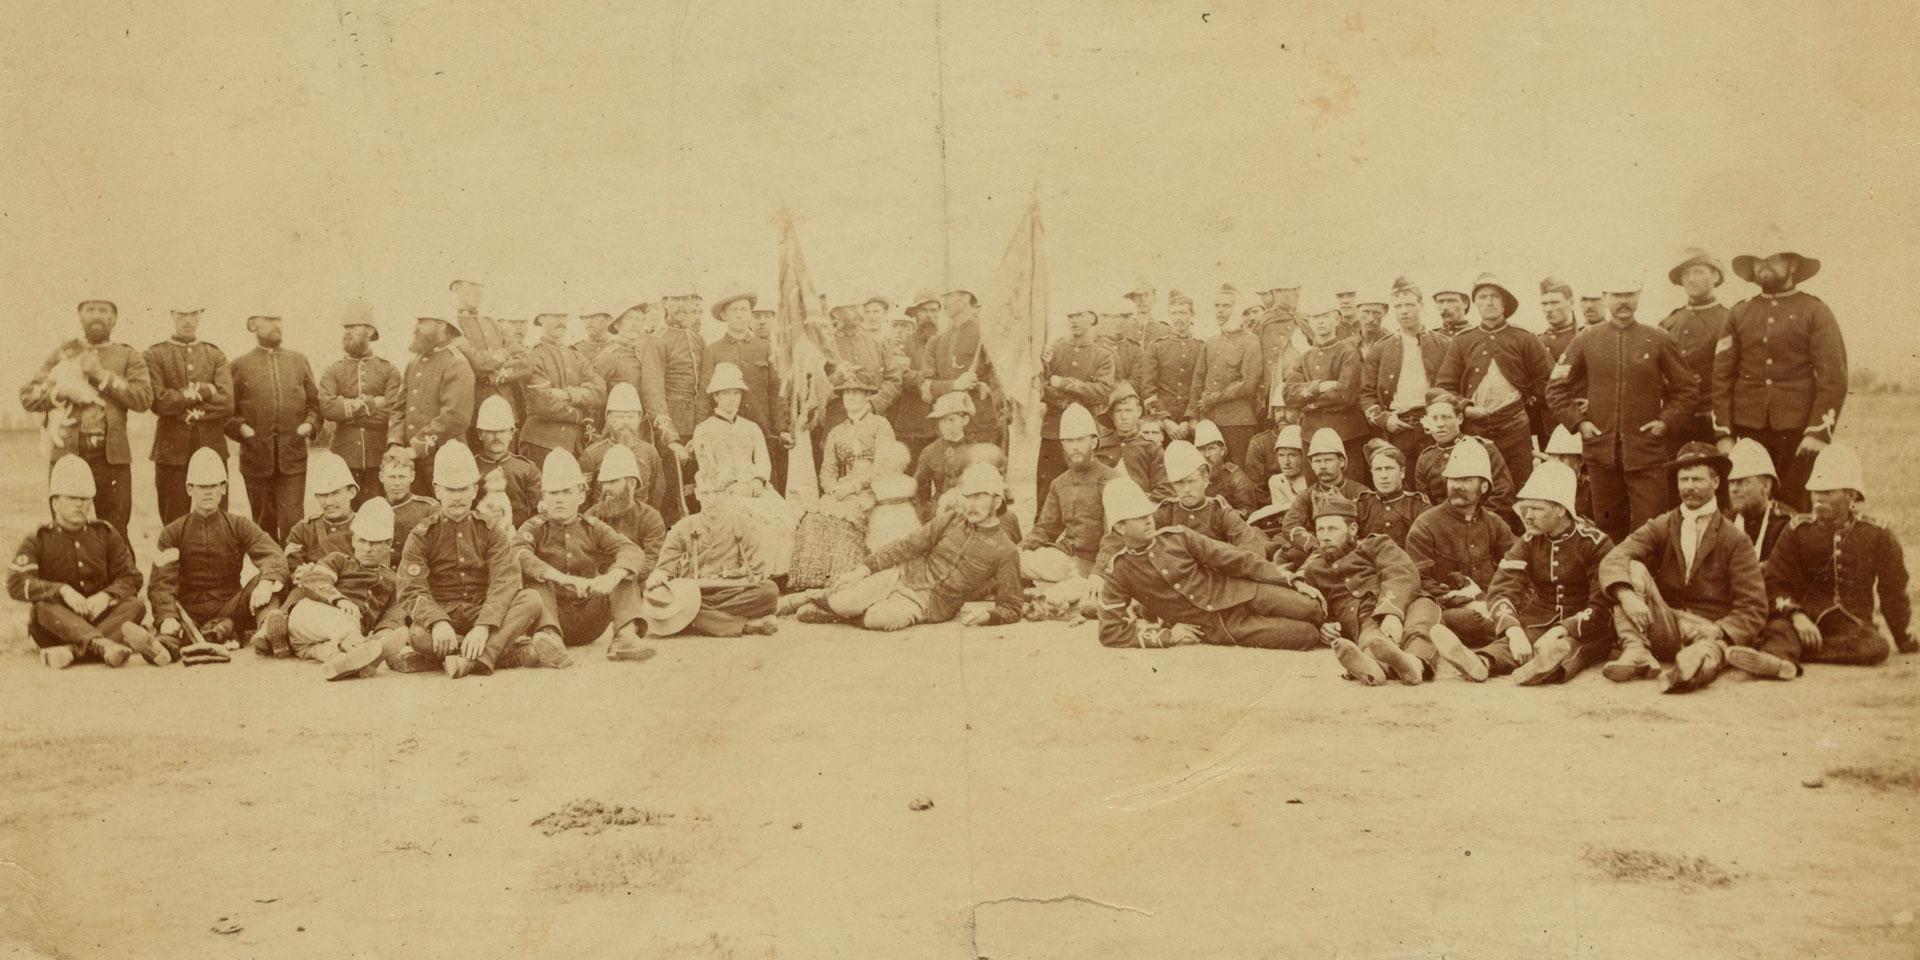 Released prisoners of the 94th Regiment from Bronkhorst Spruit, Pretoria, 1881